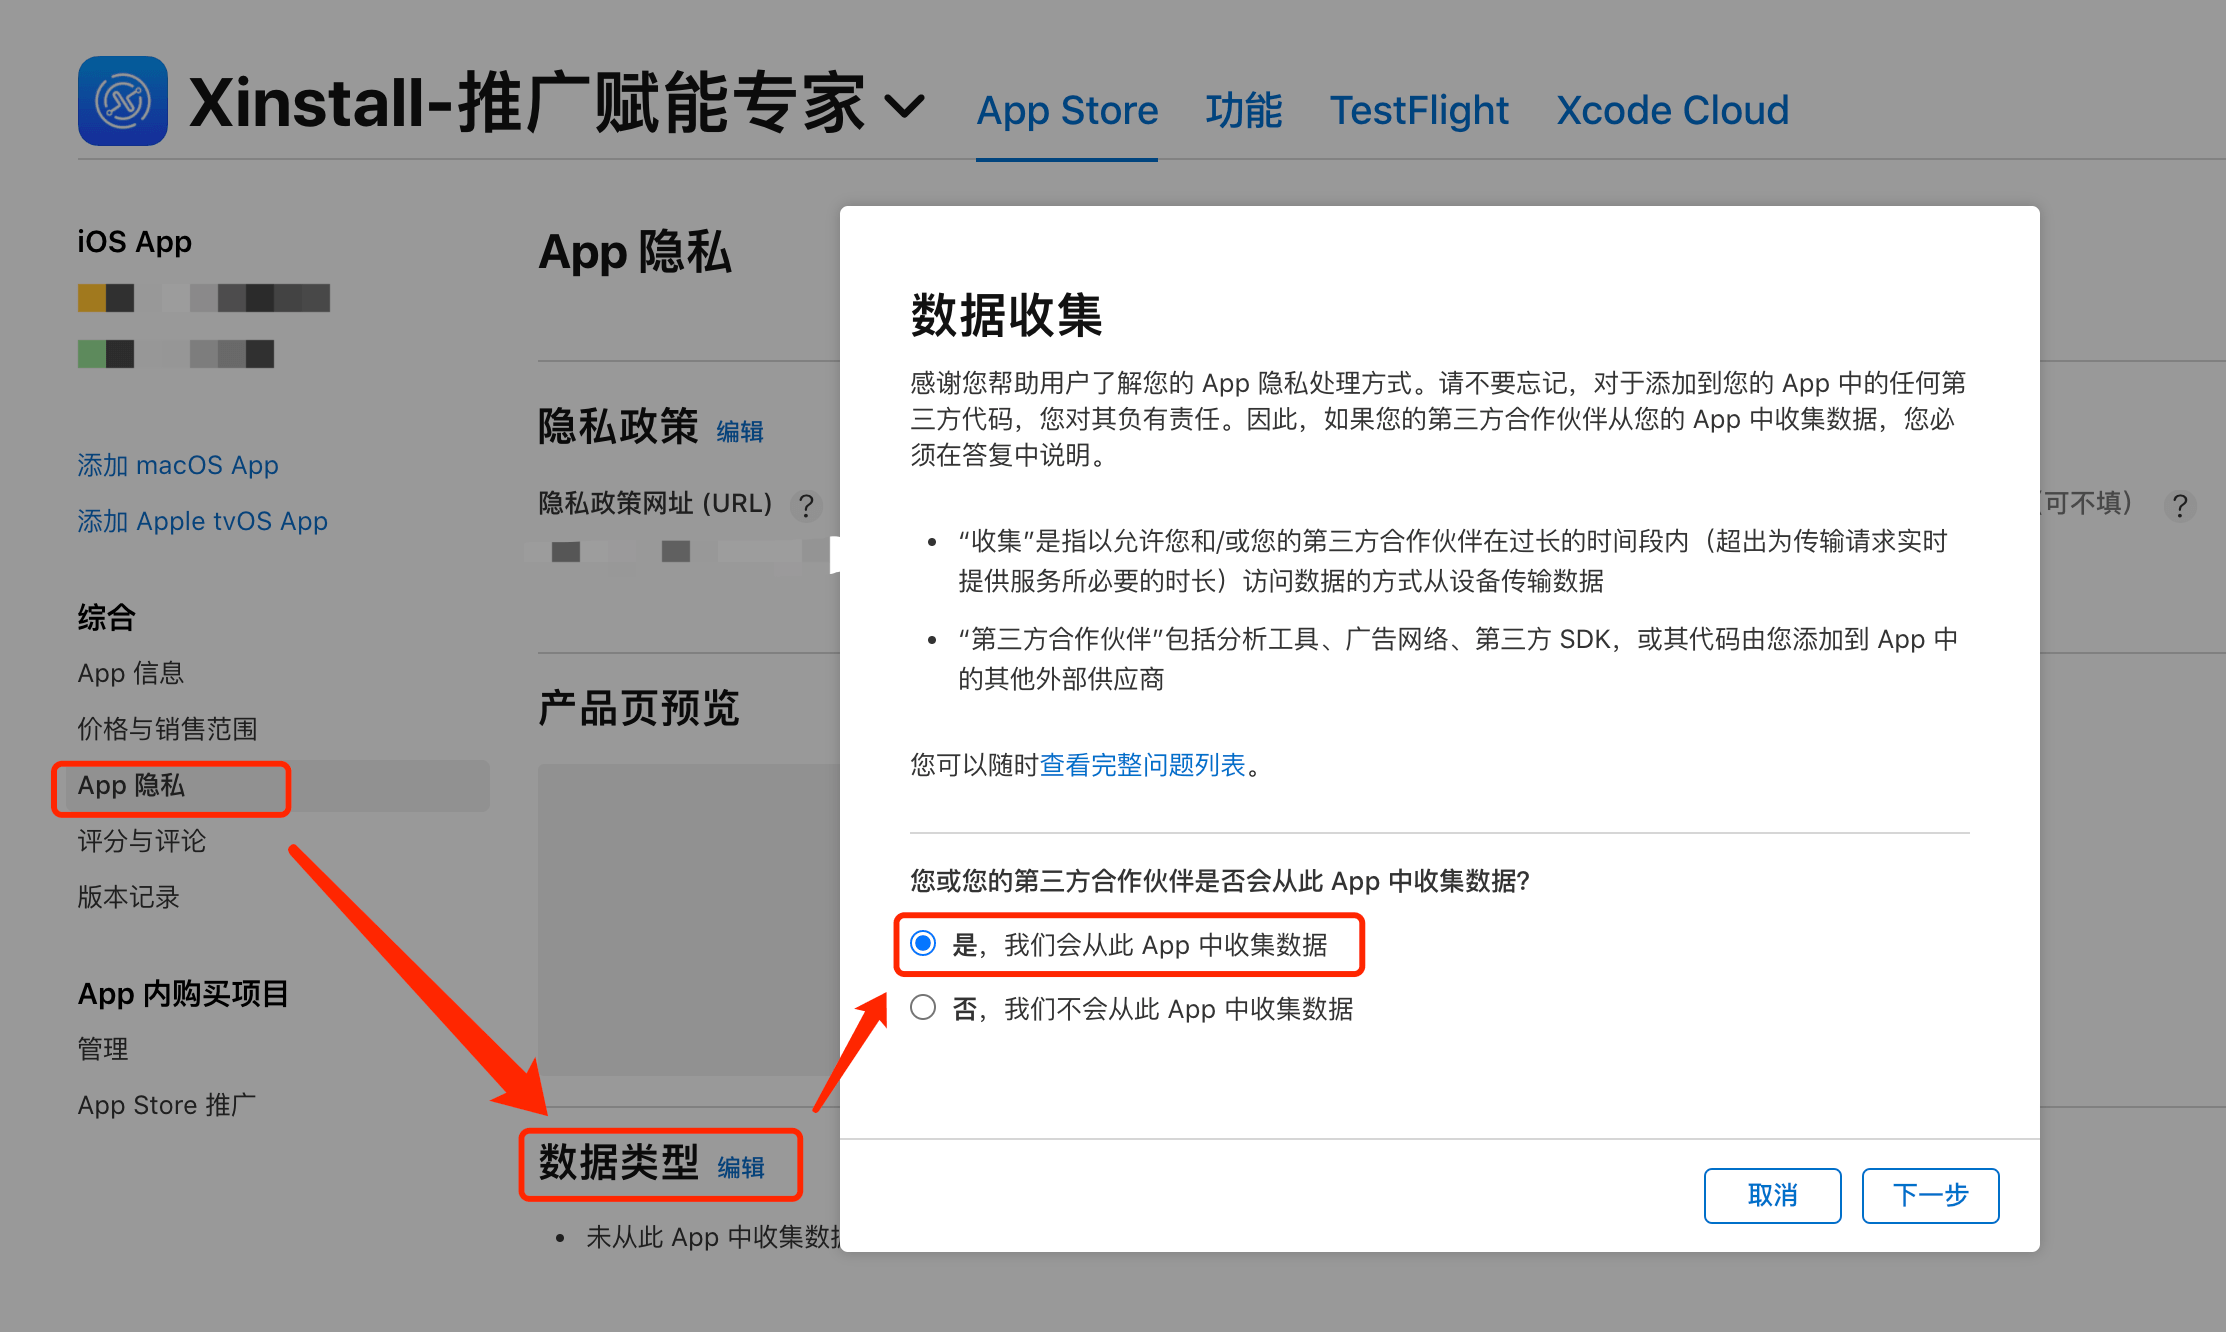 AppStore_IDFA_1